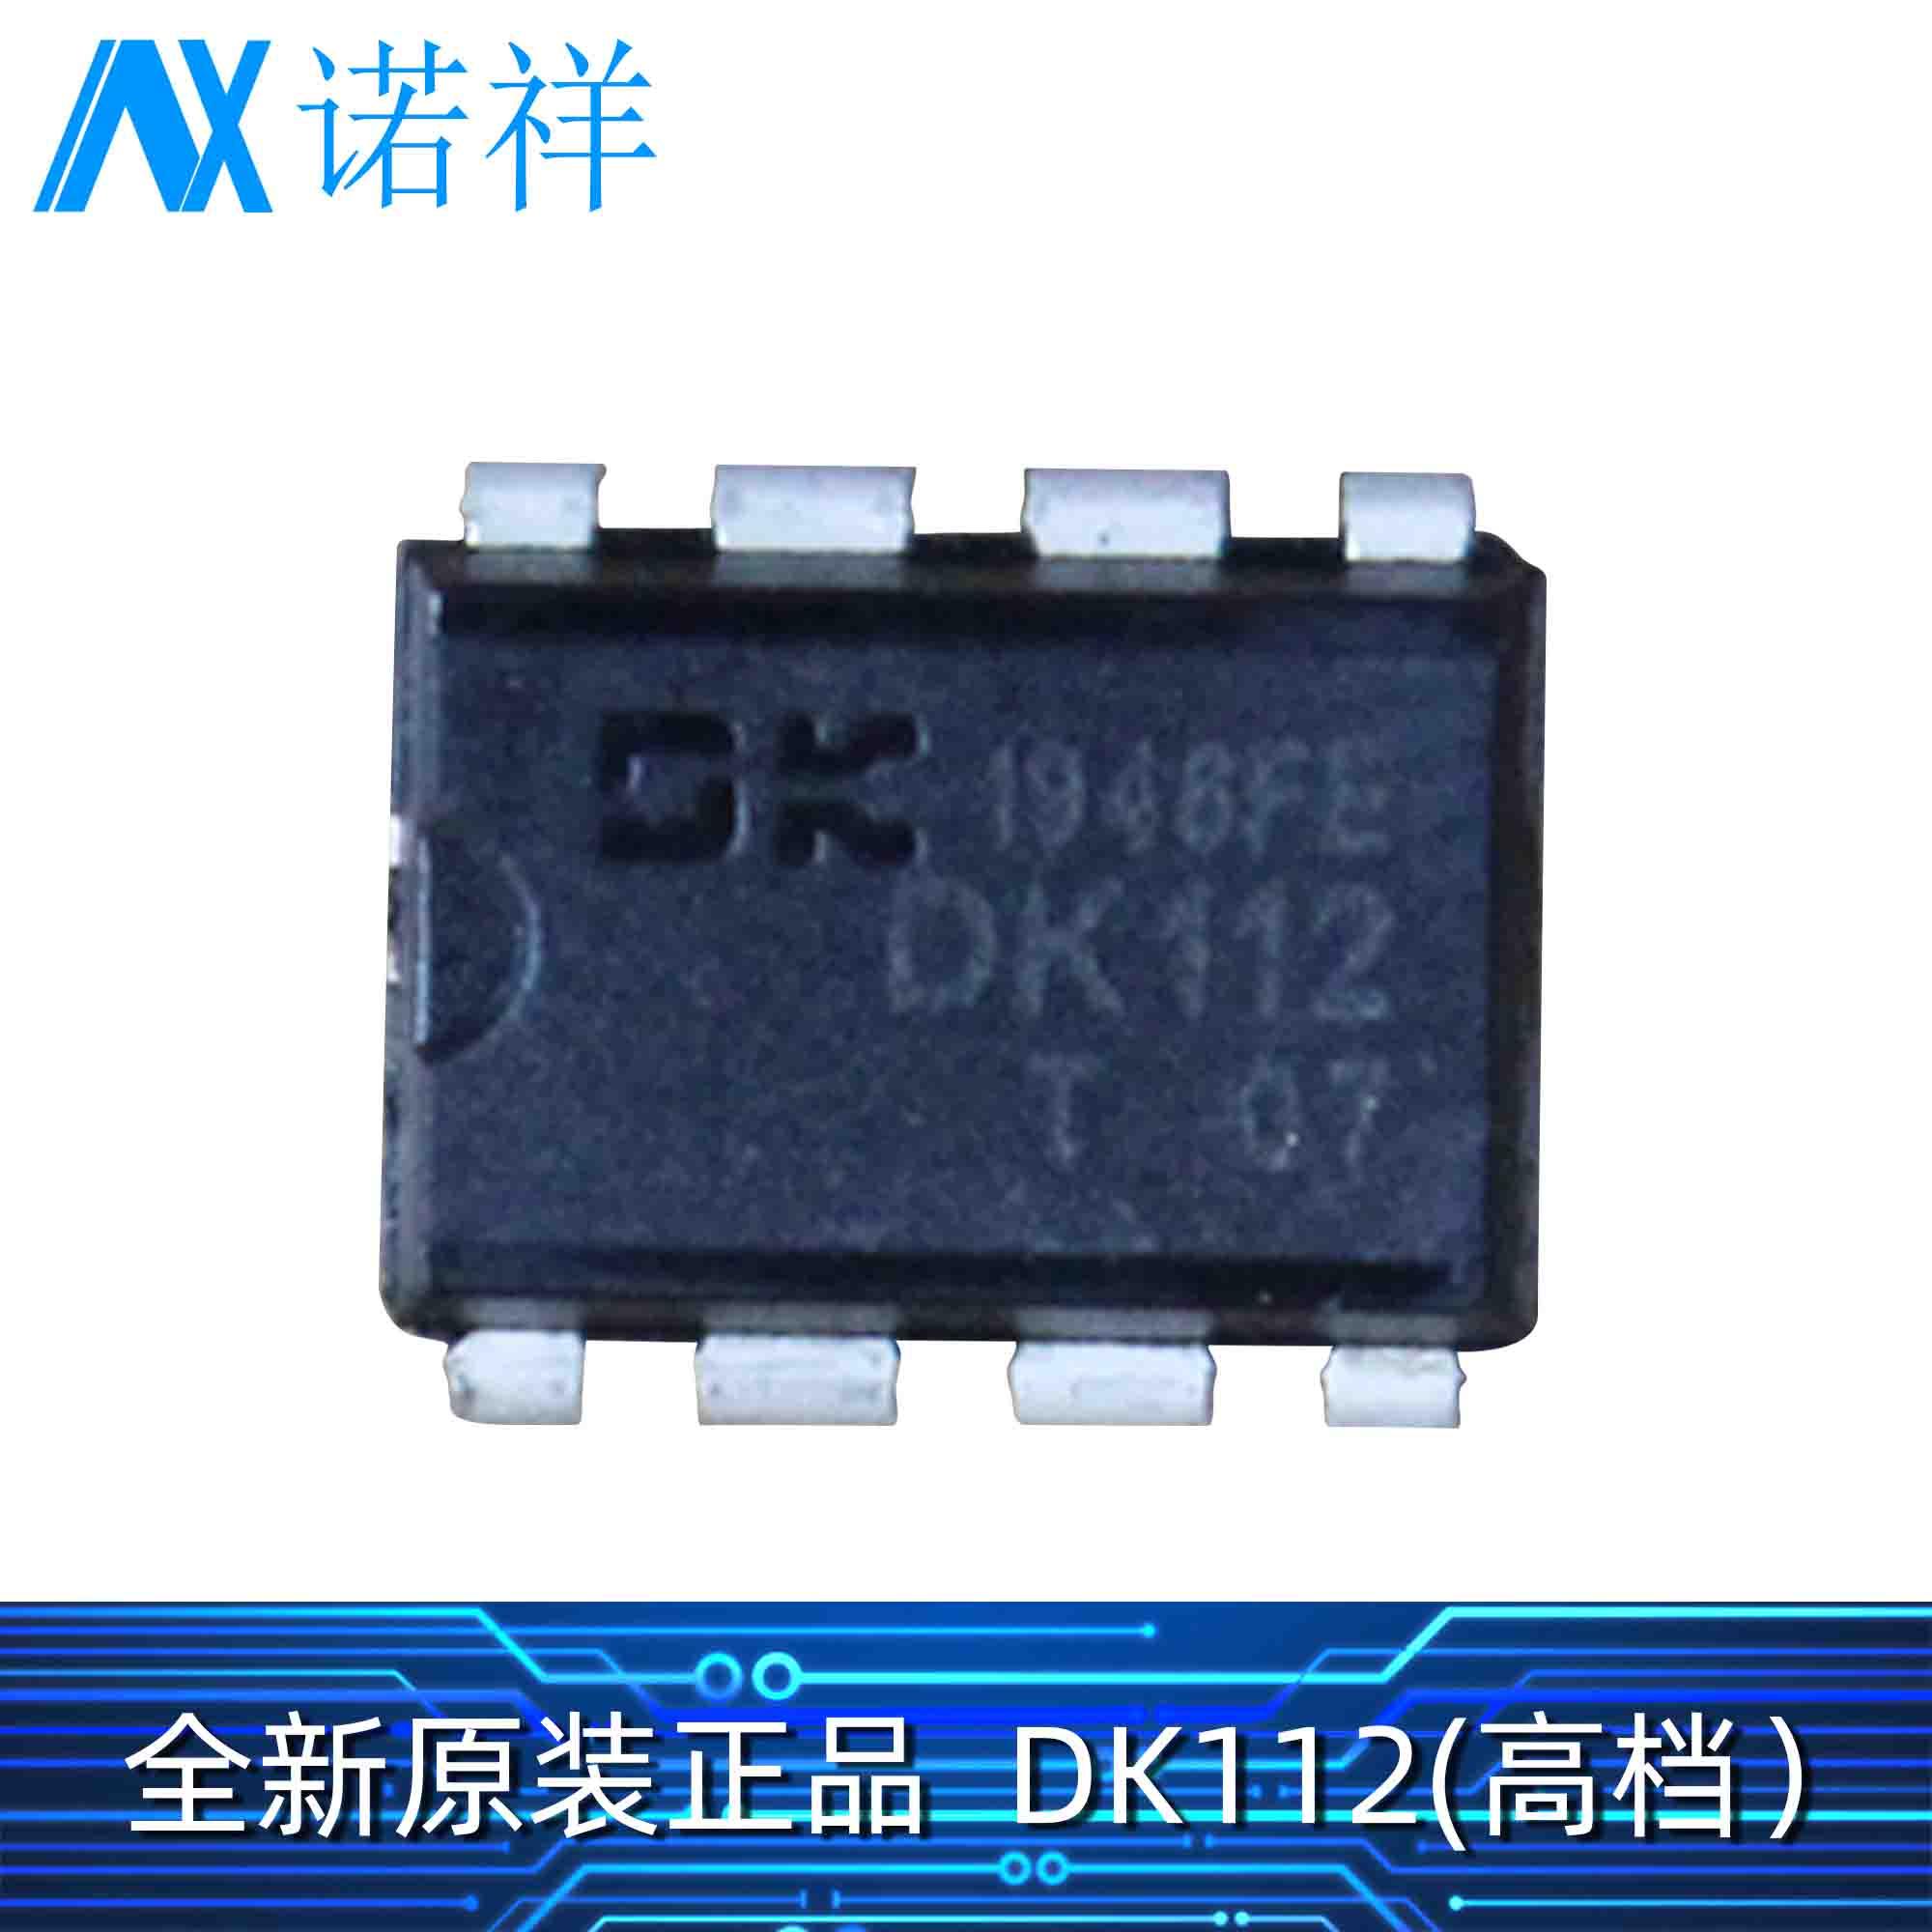 Tokos new original switch current control chip DK112 (premium) 700V 660ma DIP8